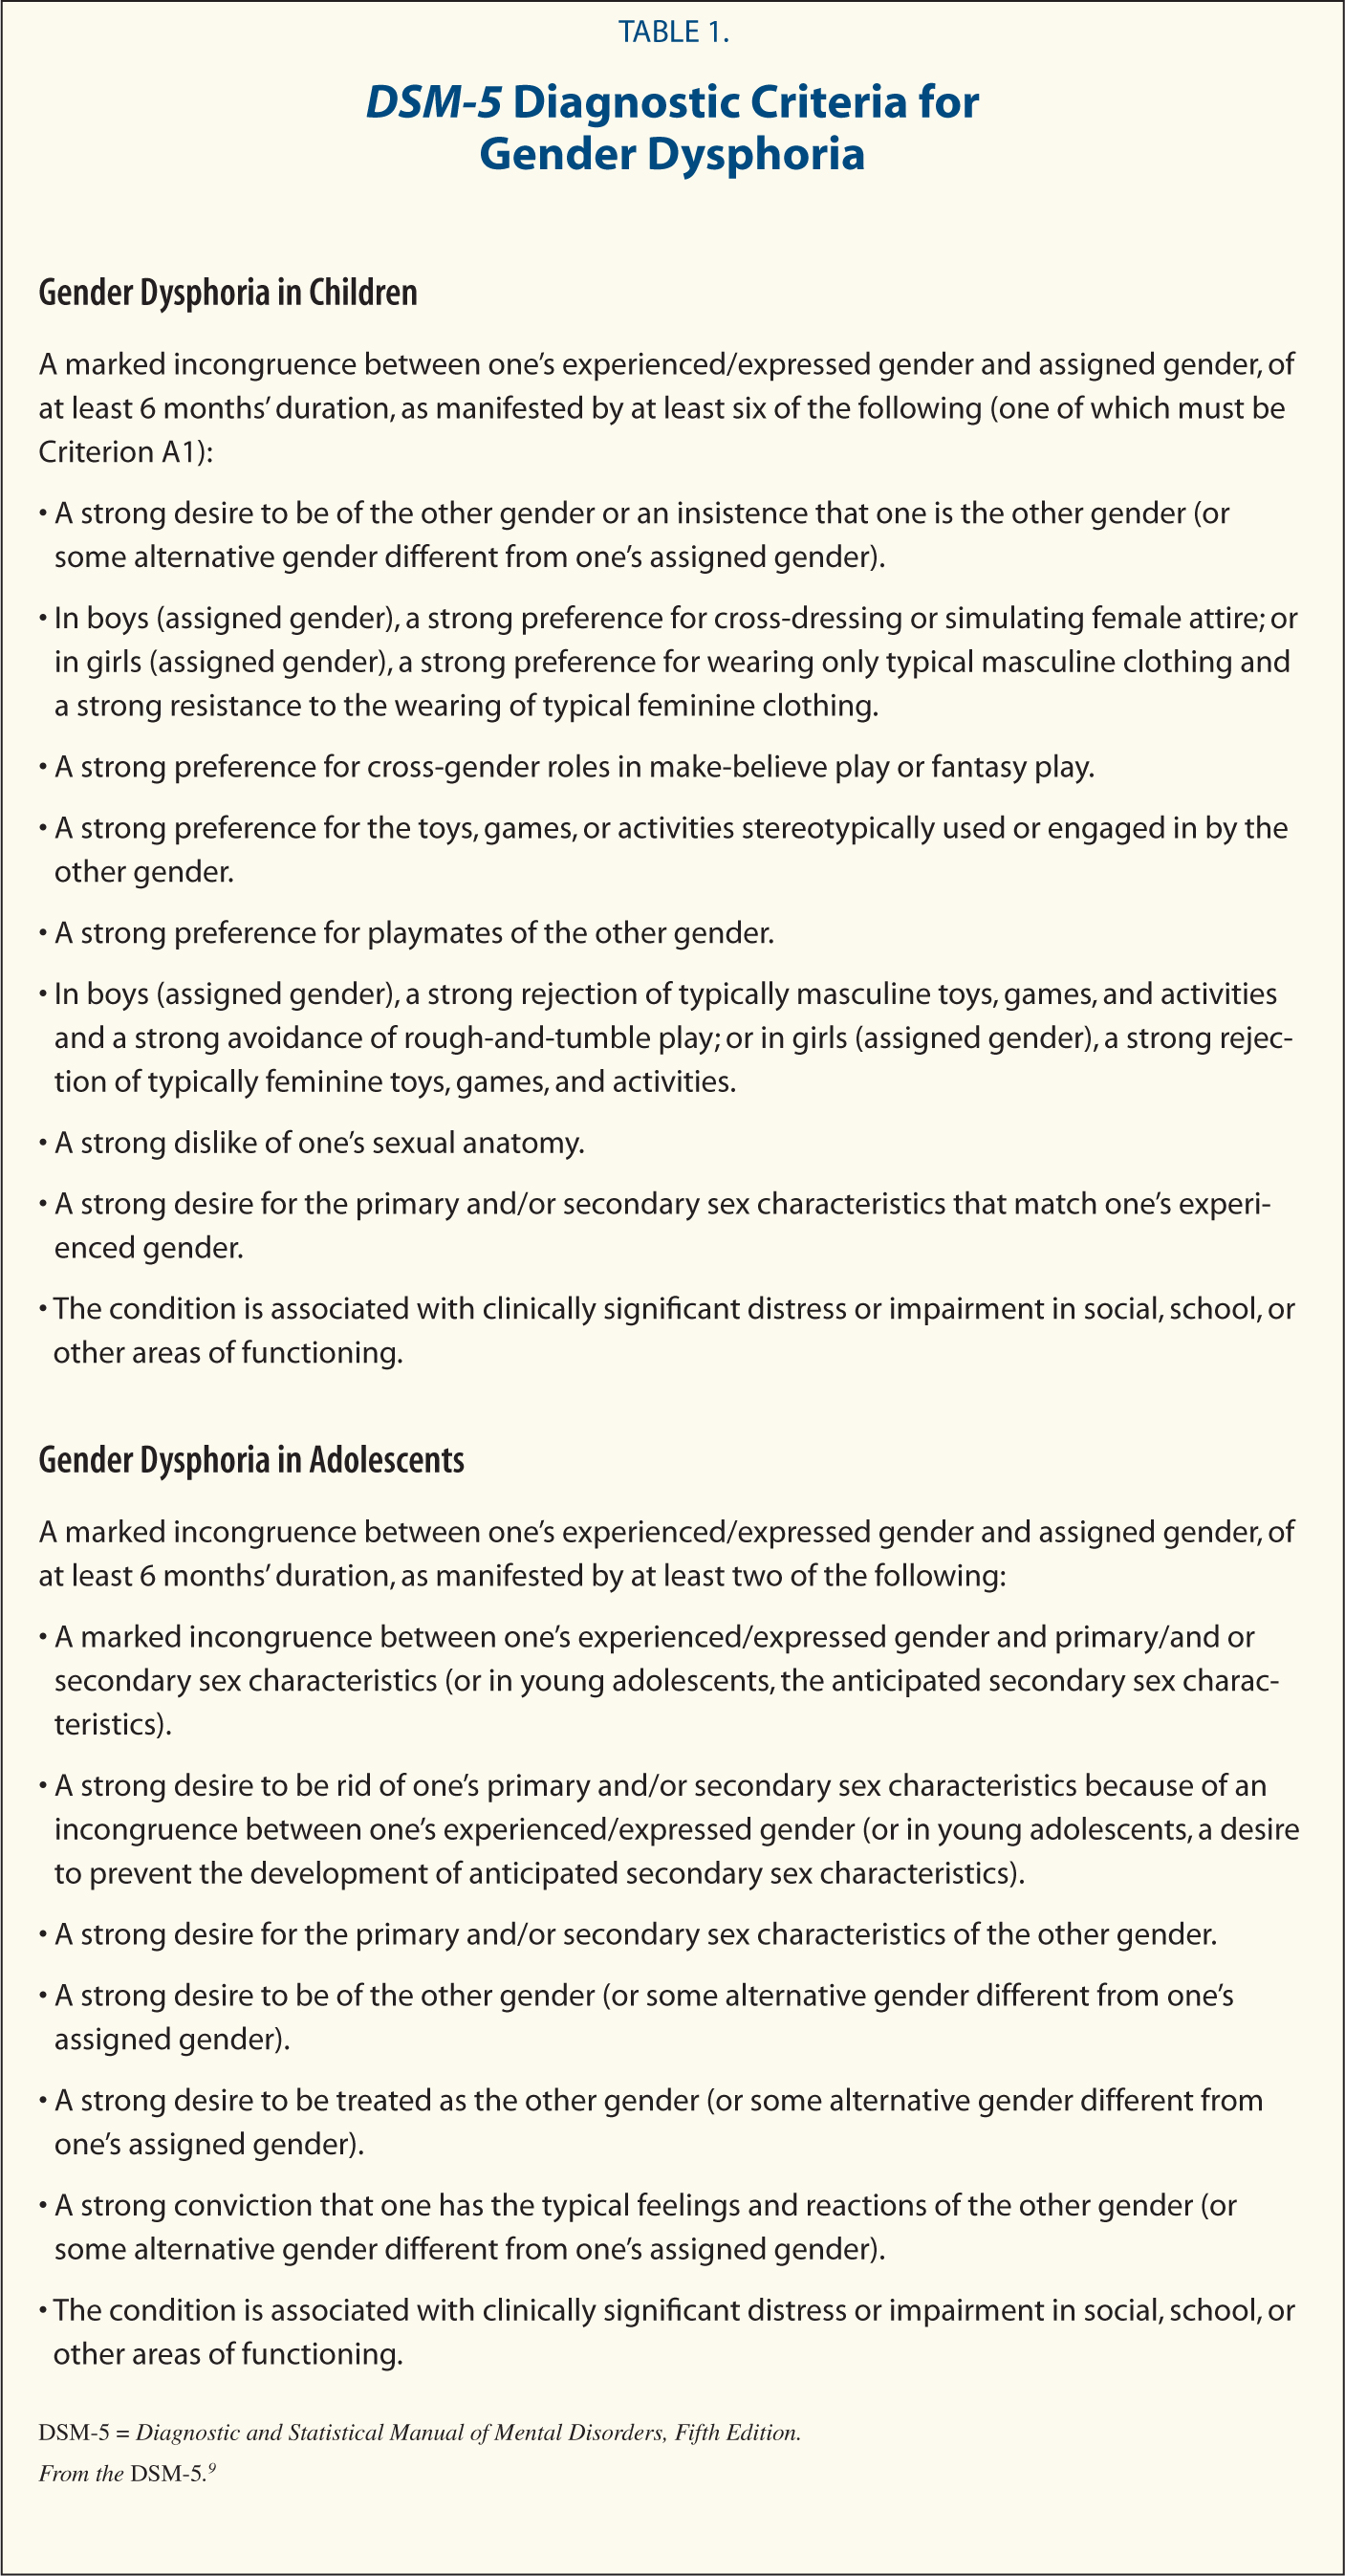 DSM-5 Diagnostic Criteria for Gender Dysphoria